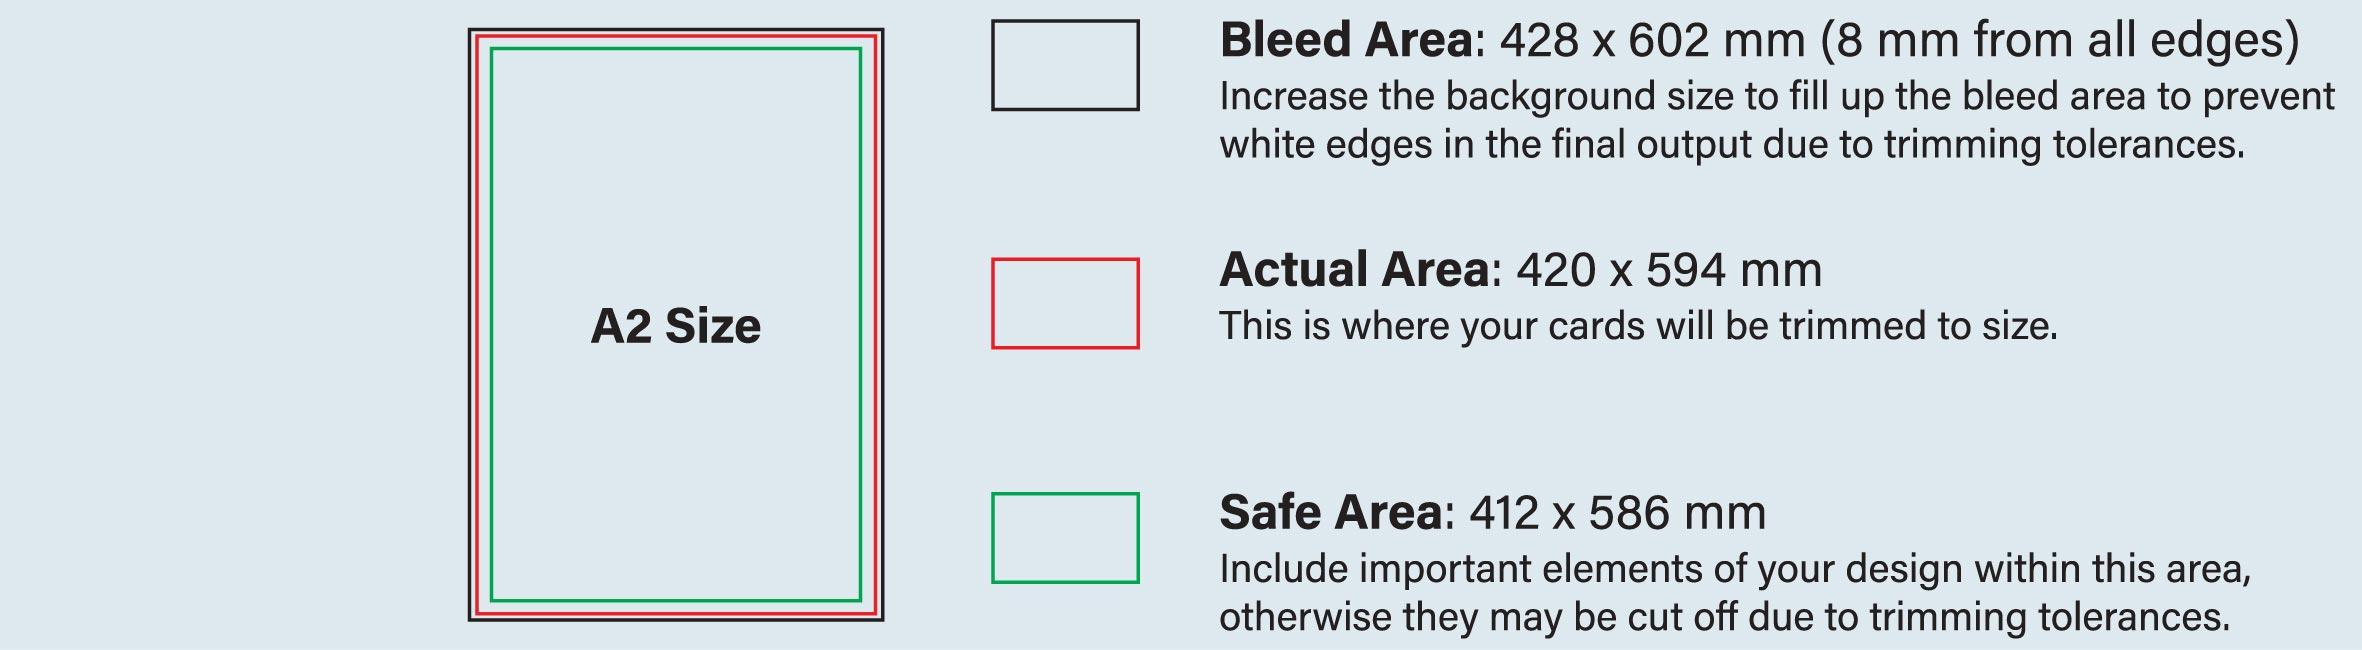 Poster Design Guideline